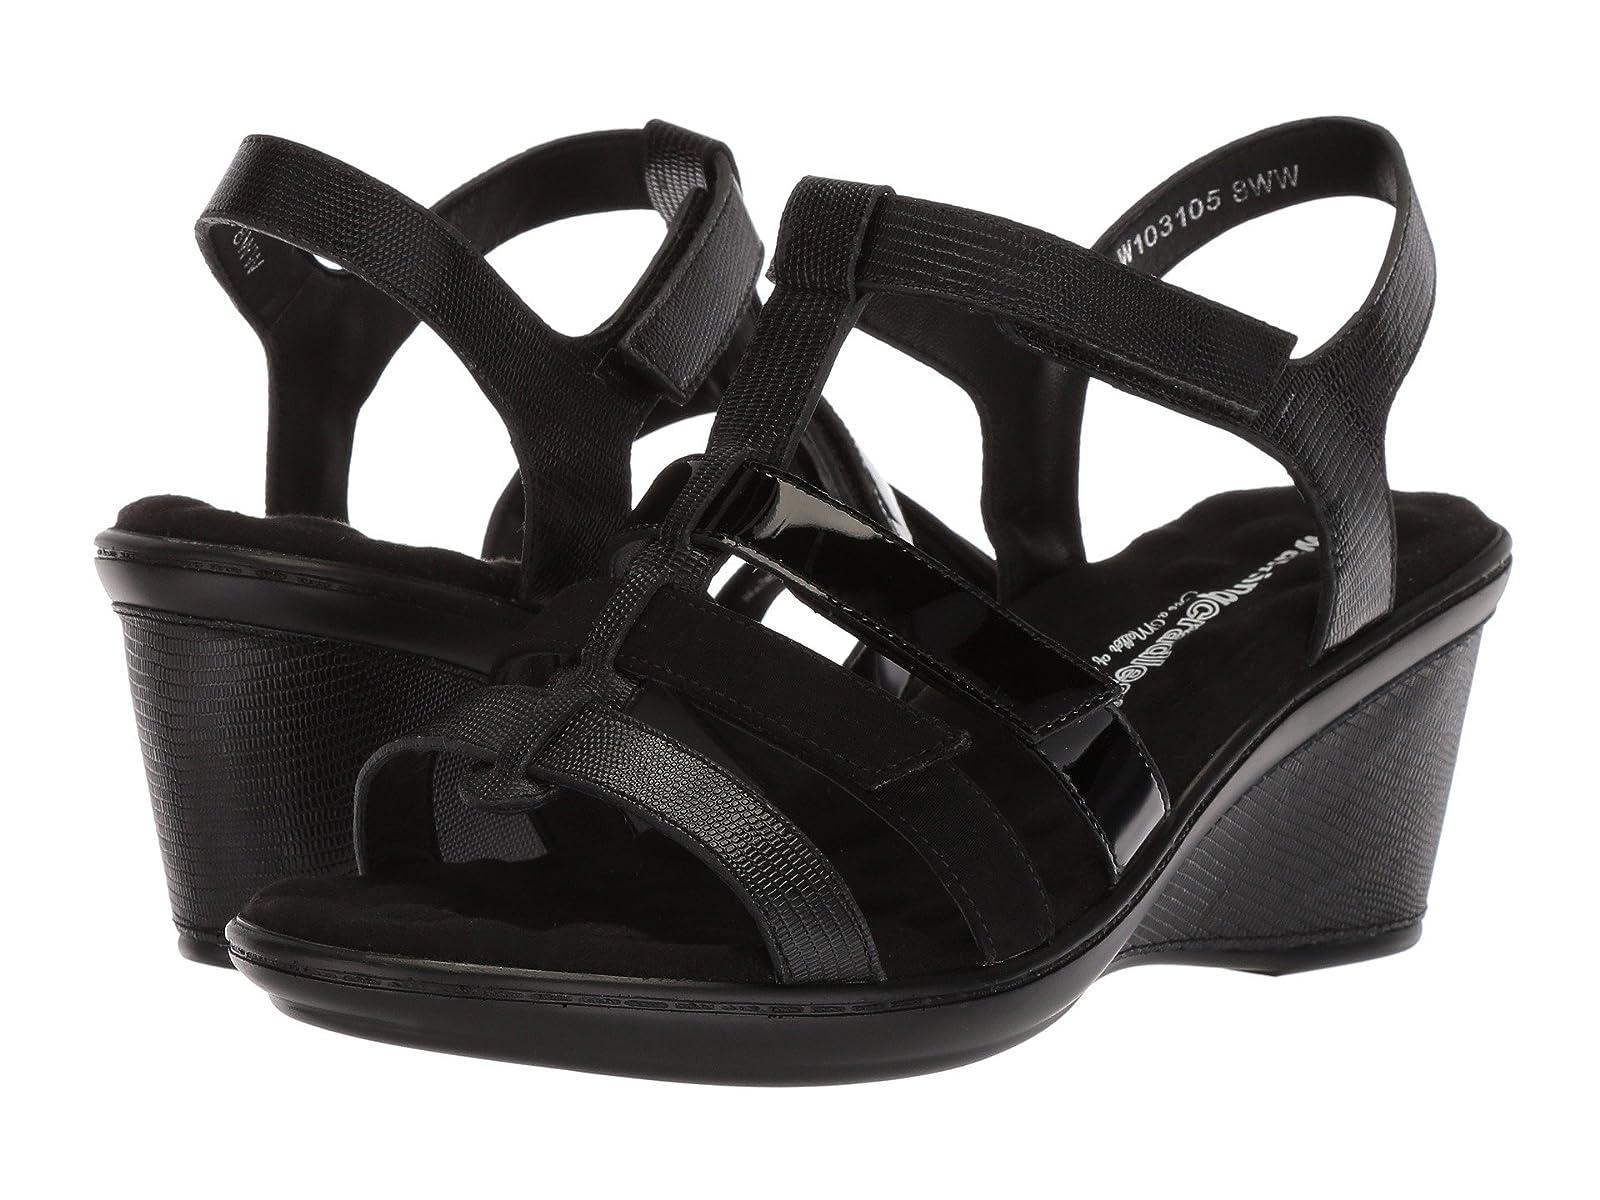 Walking Cradles LaurelCheap and distinctive eye-catching shoes